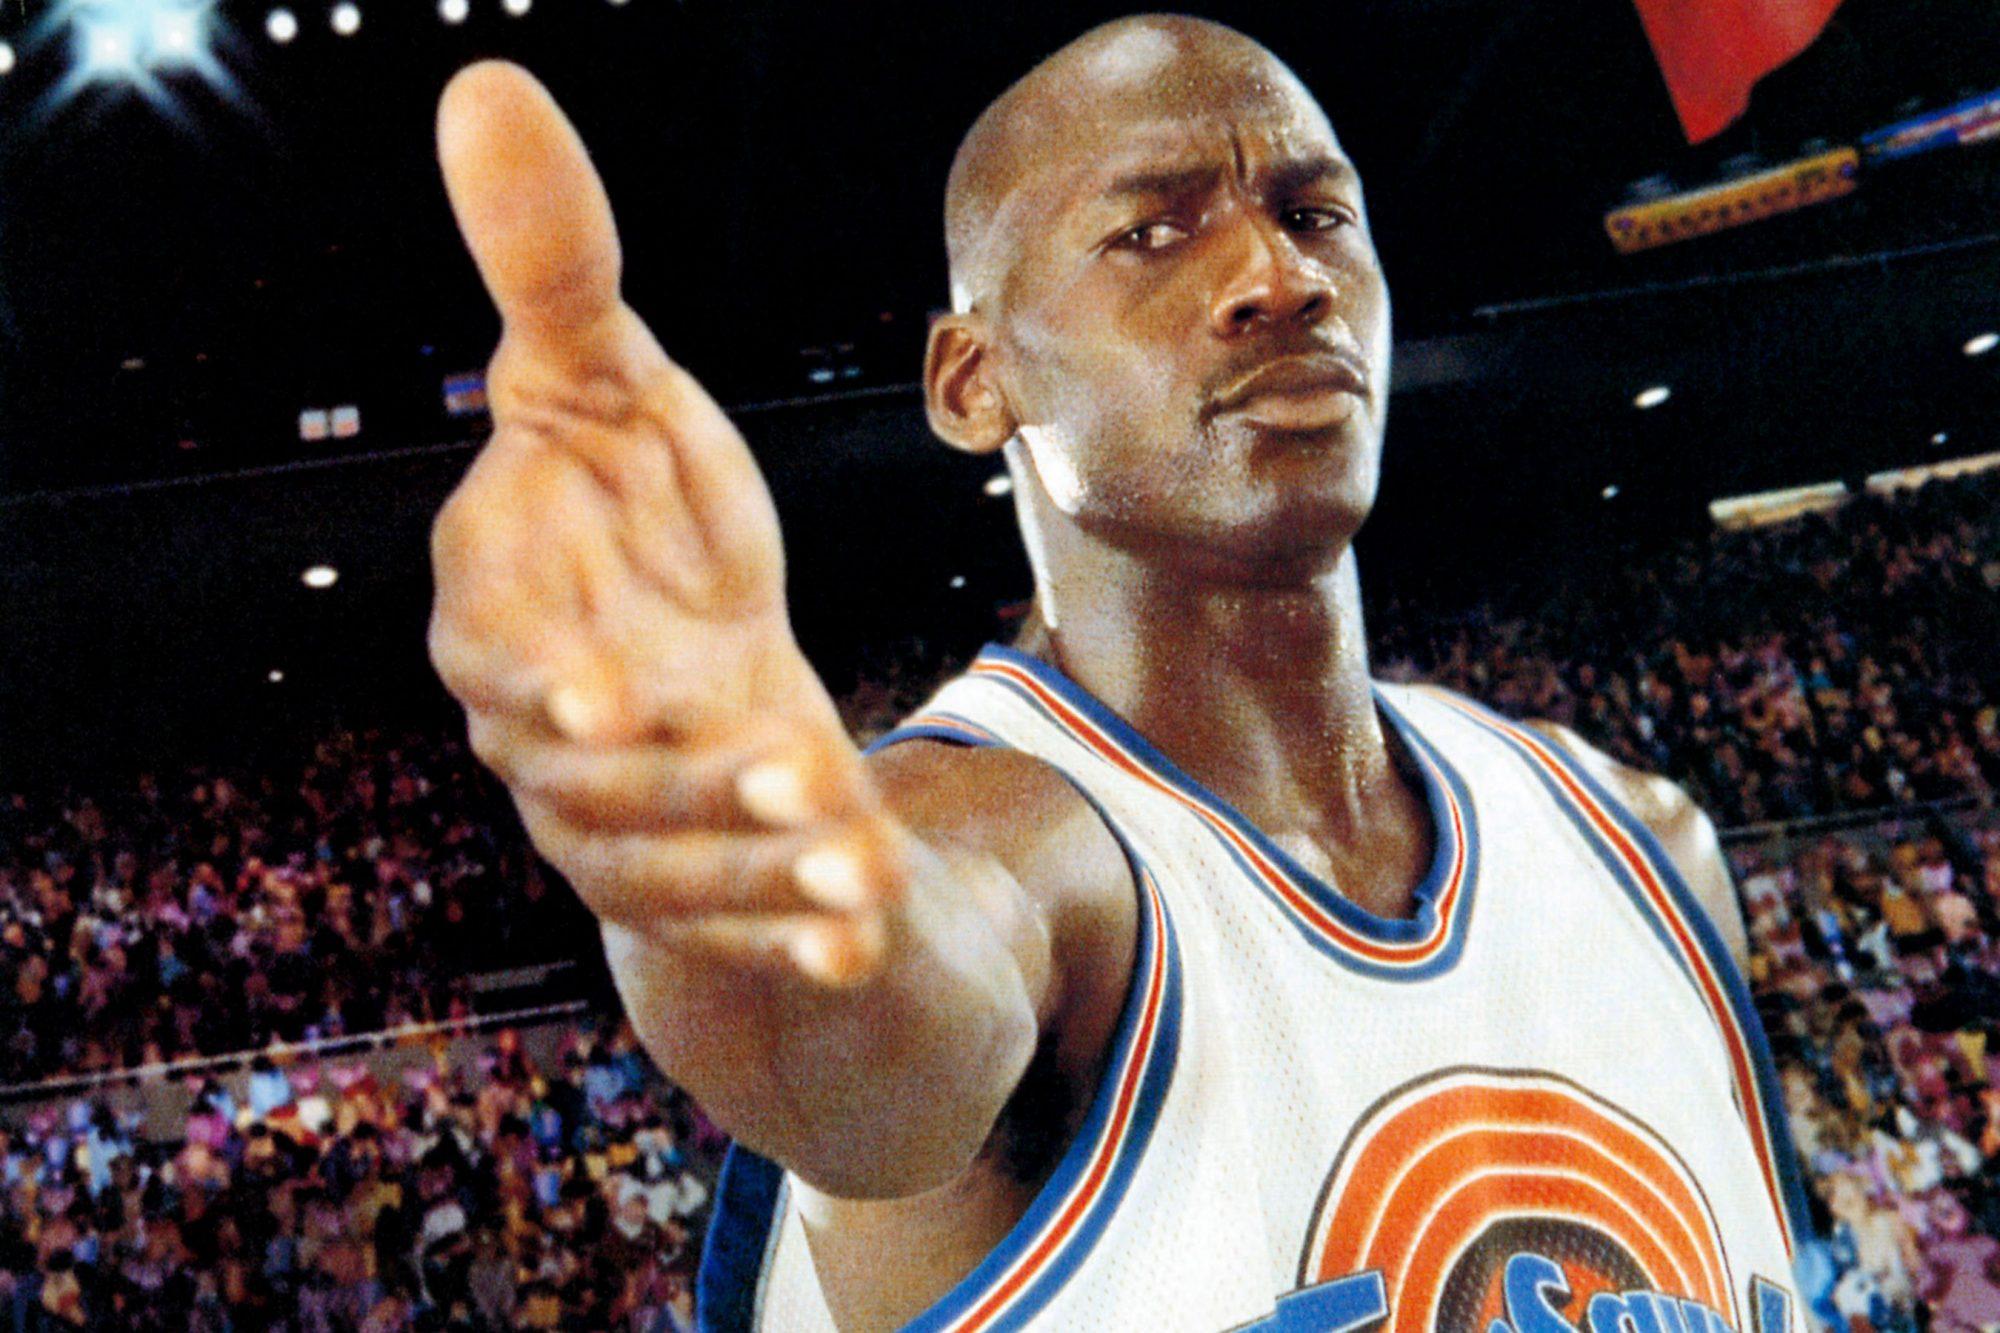 SPACE JAM, Michael Jordan, 1996, © Warner Brothers/courtesy Everett Collection